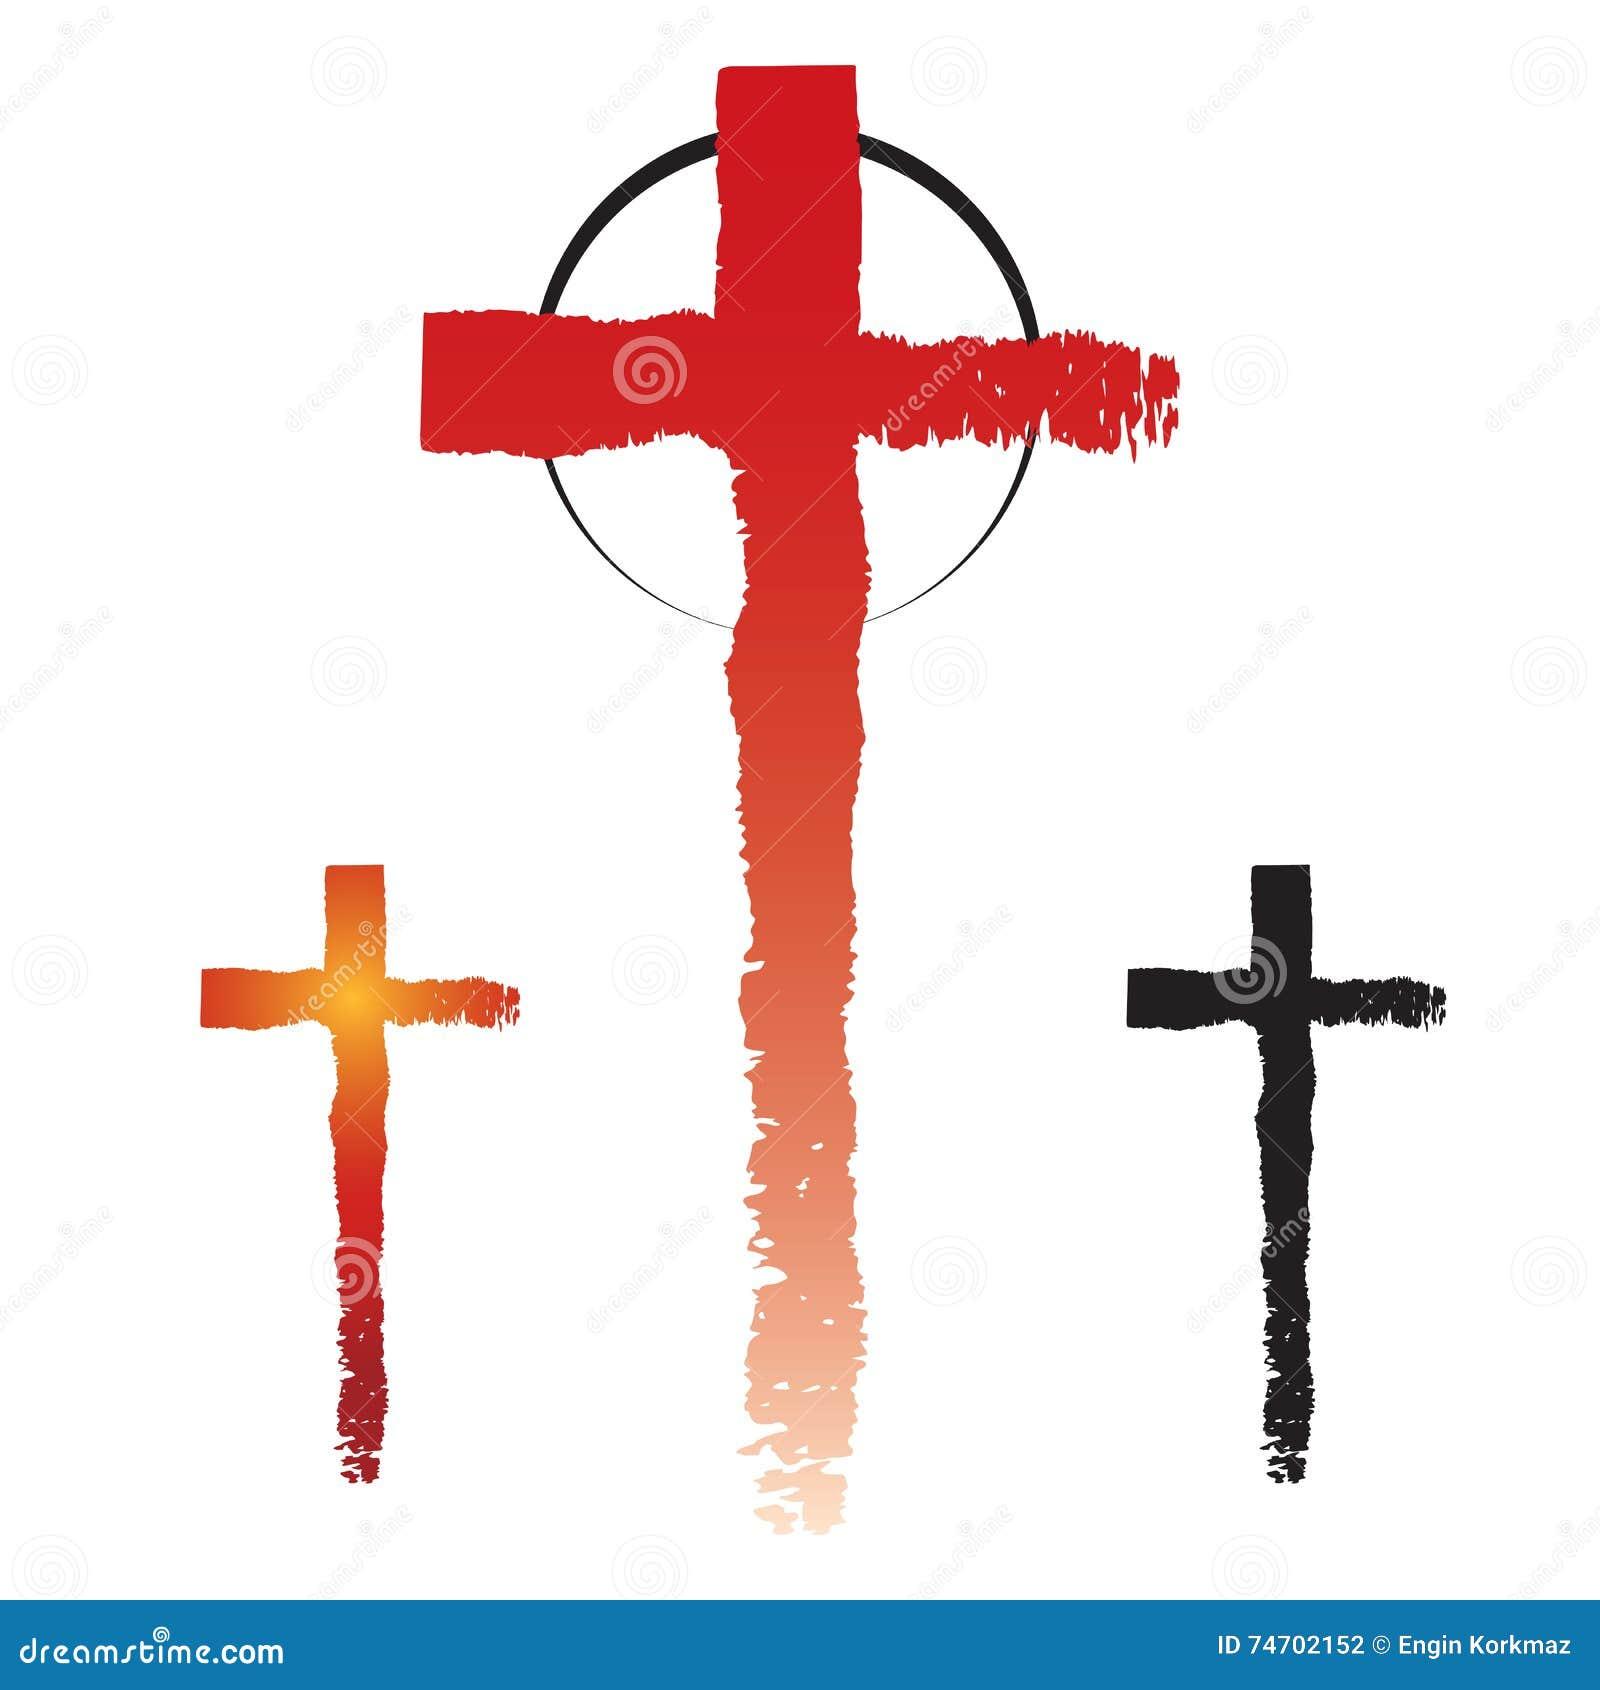 Christianity cross symbols stock vector illustration of collection christianity cross symbols biocorpaavc Gallery